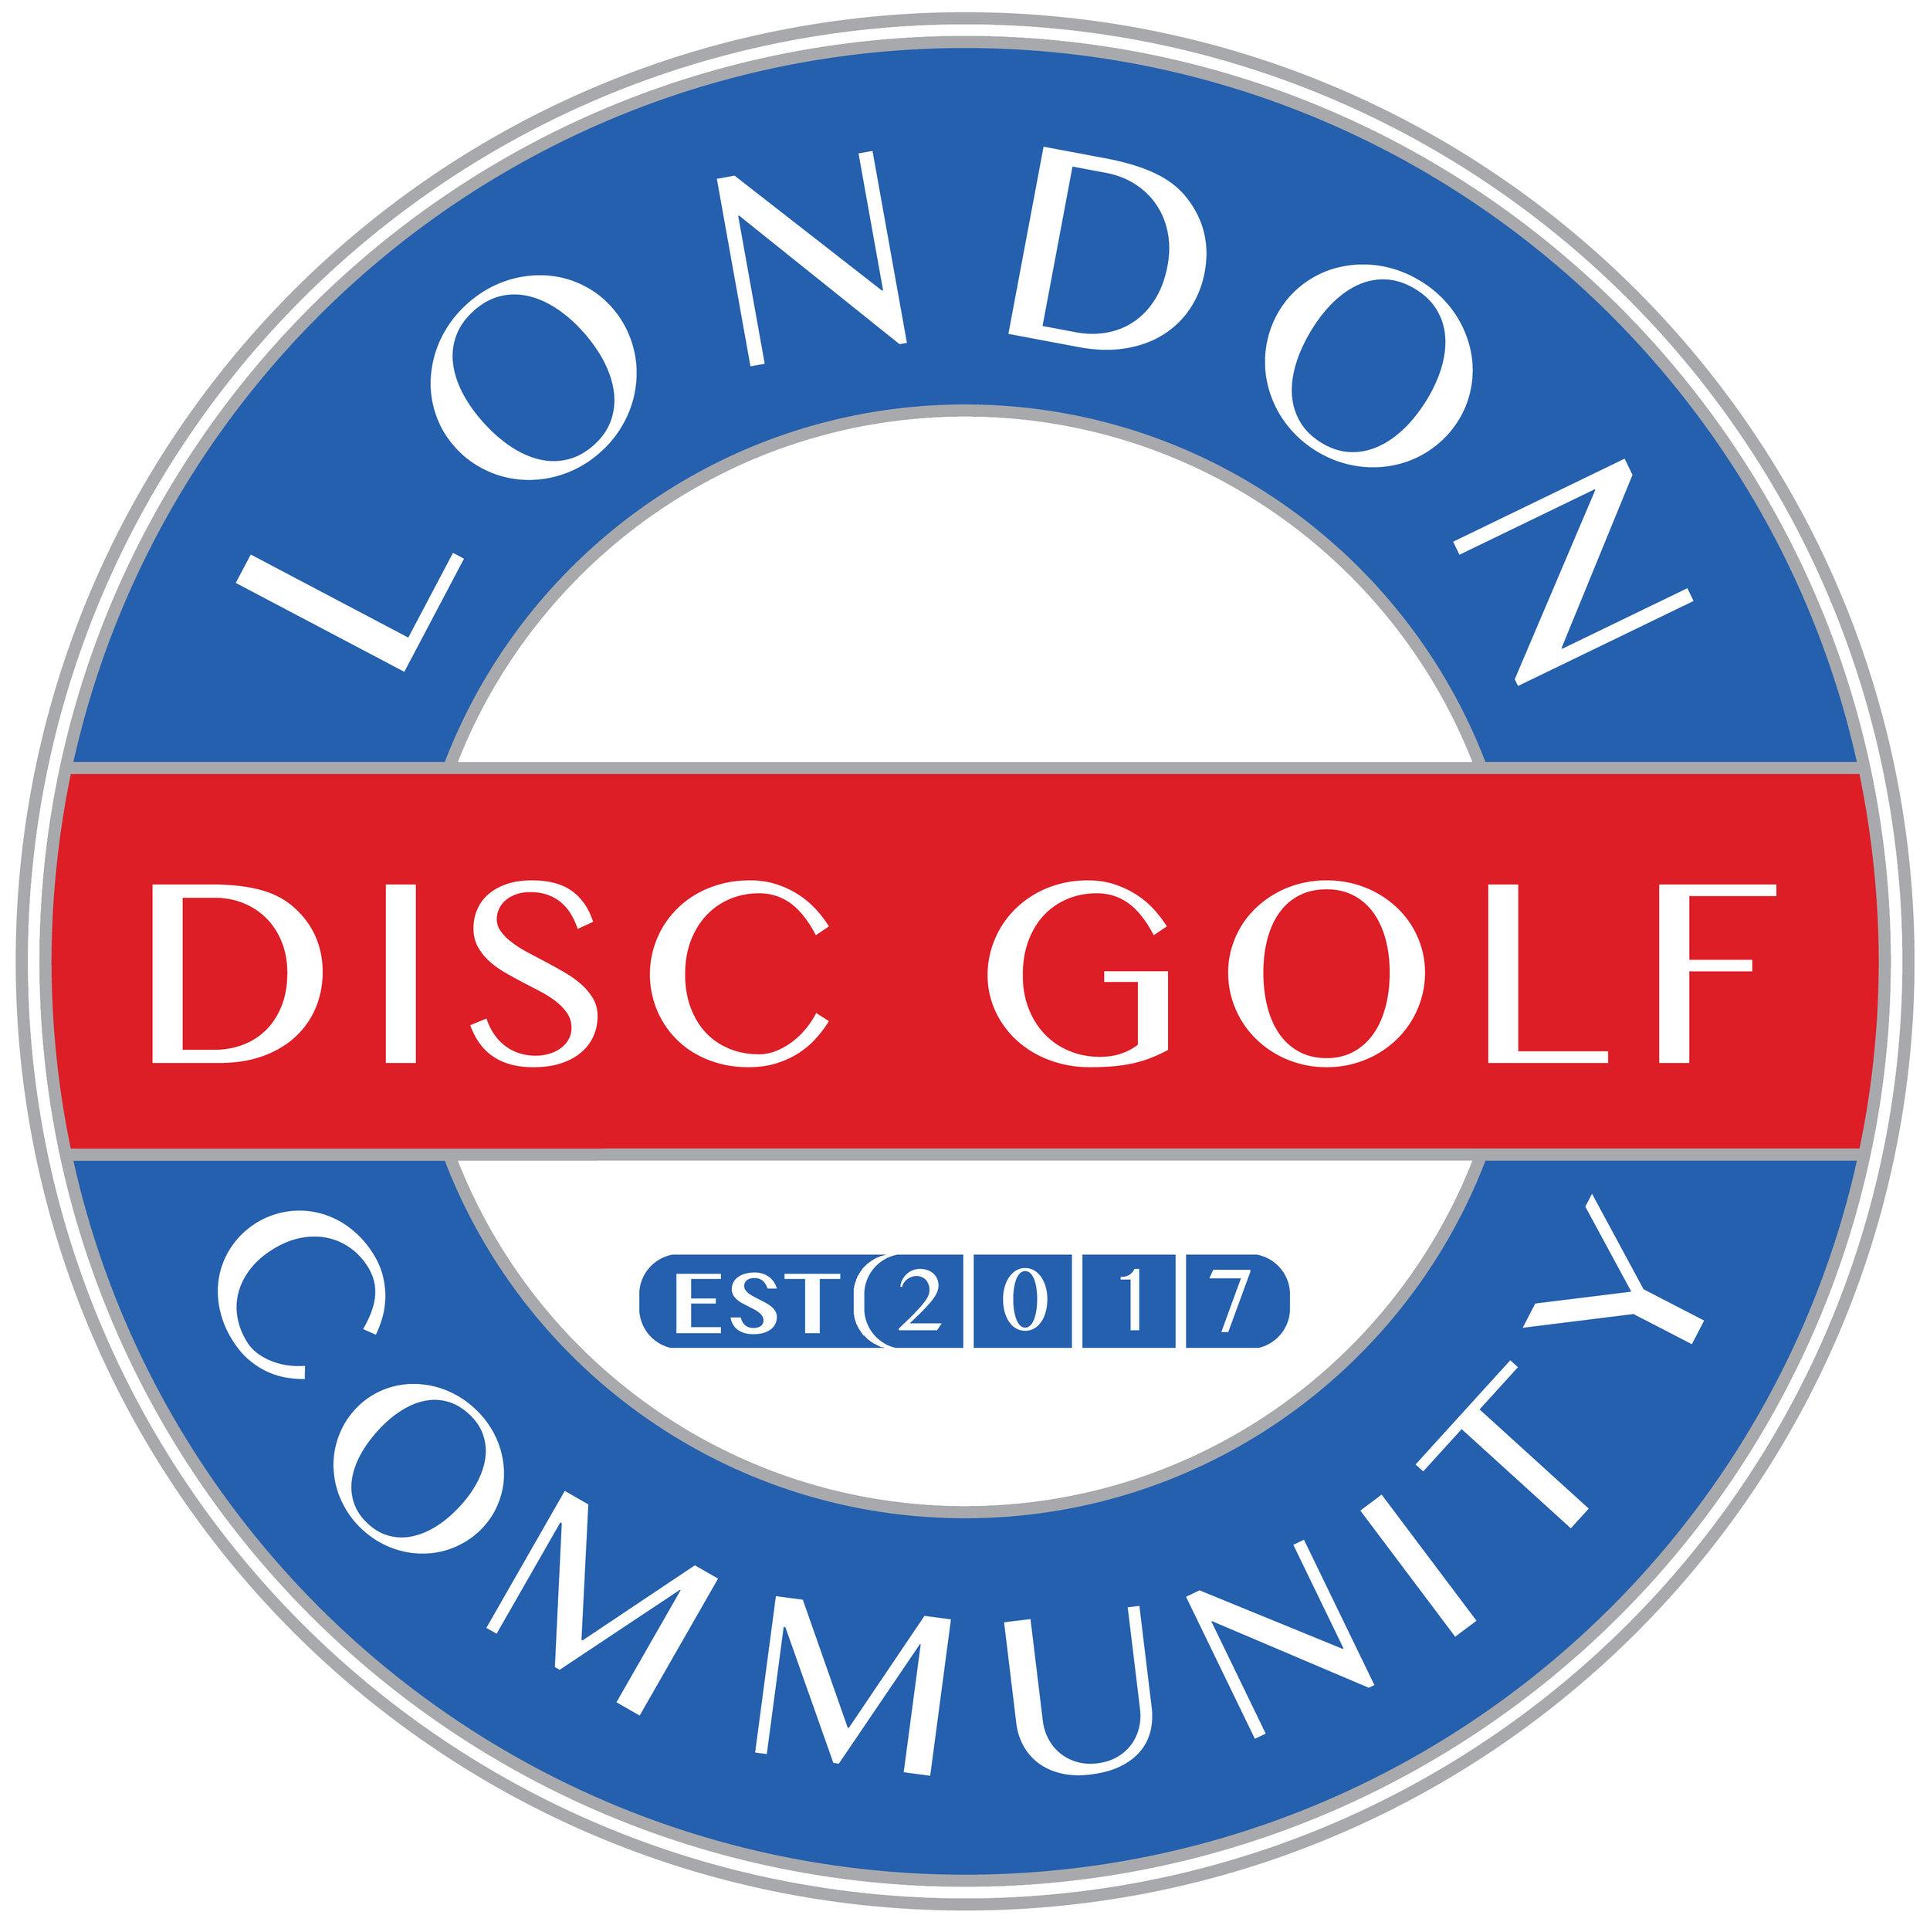 London Disc Golf Community